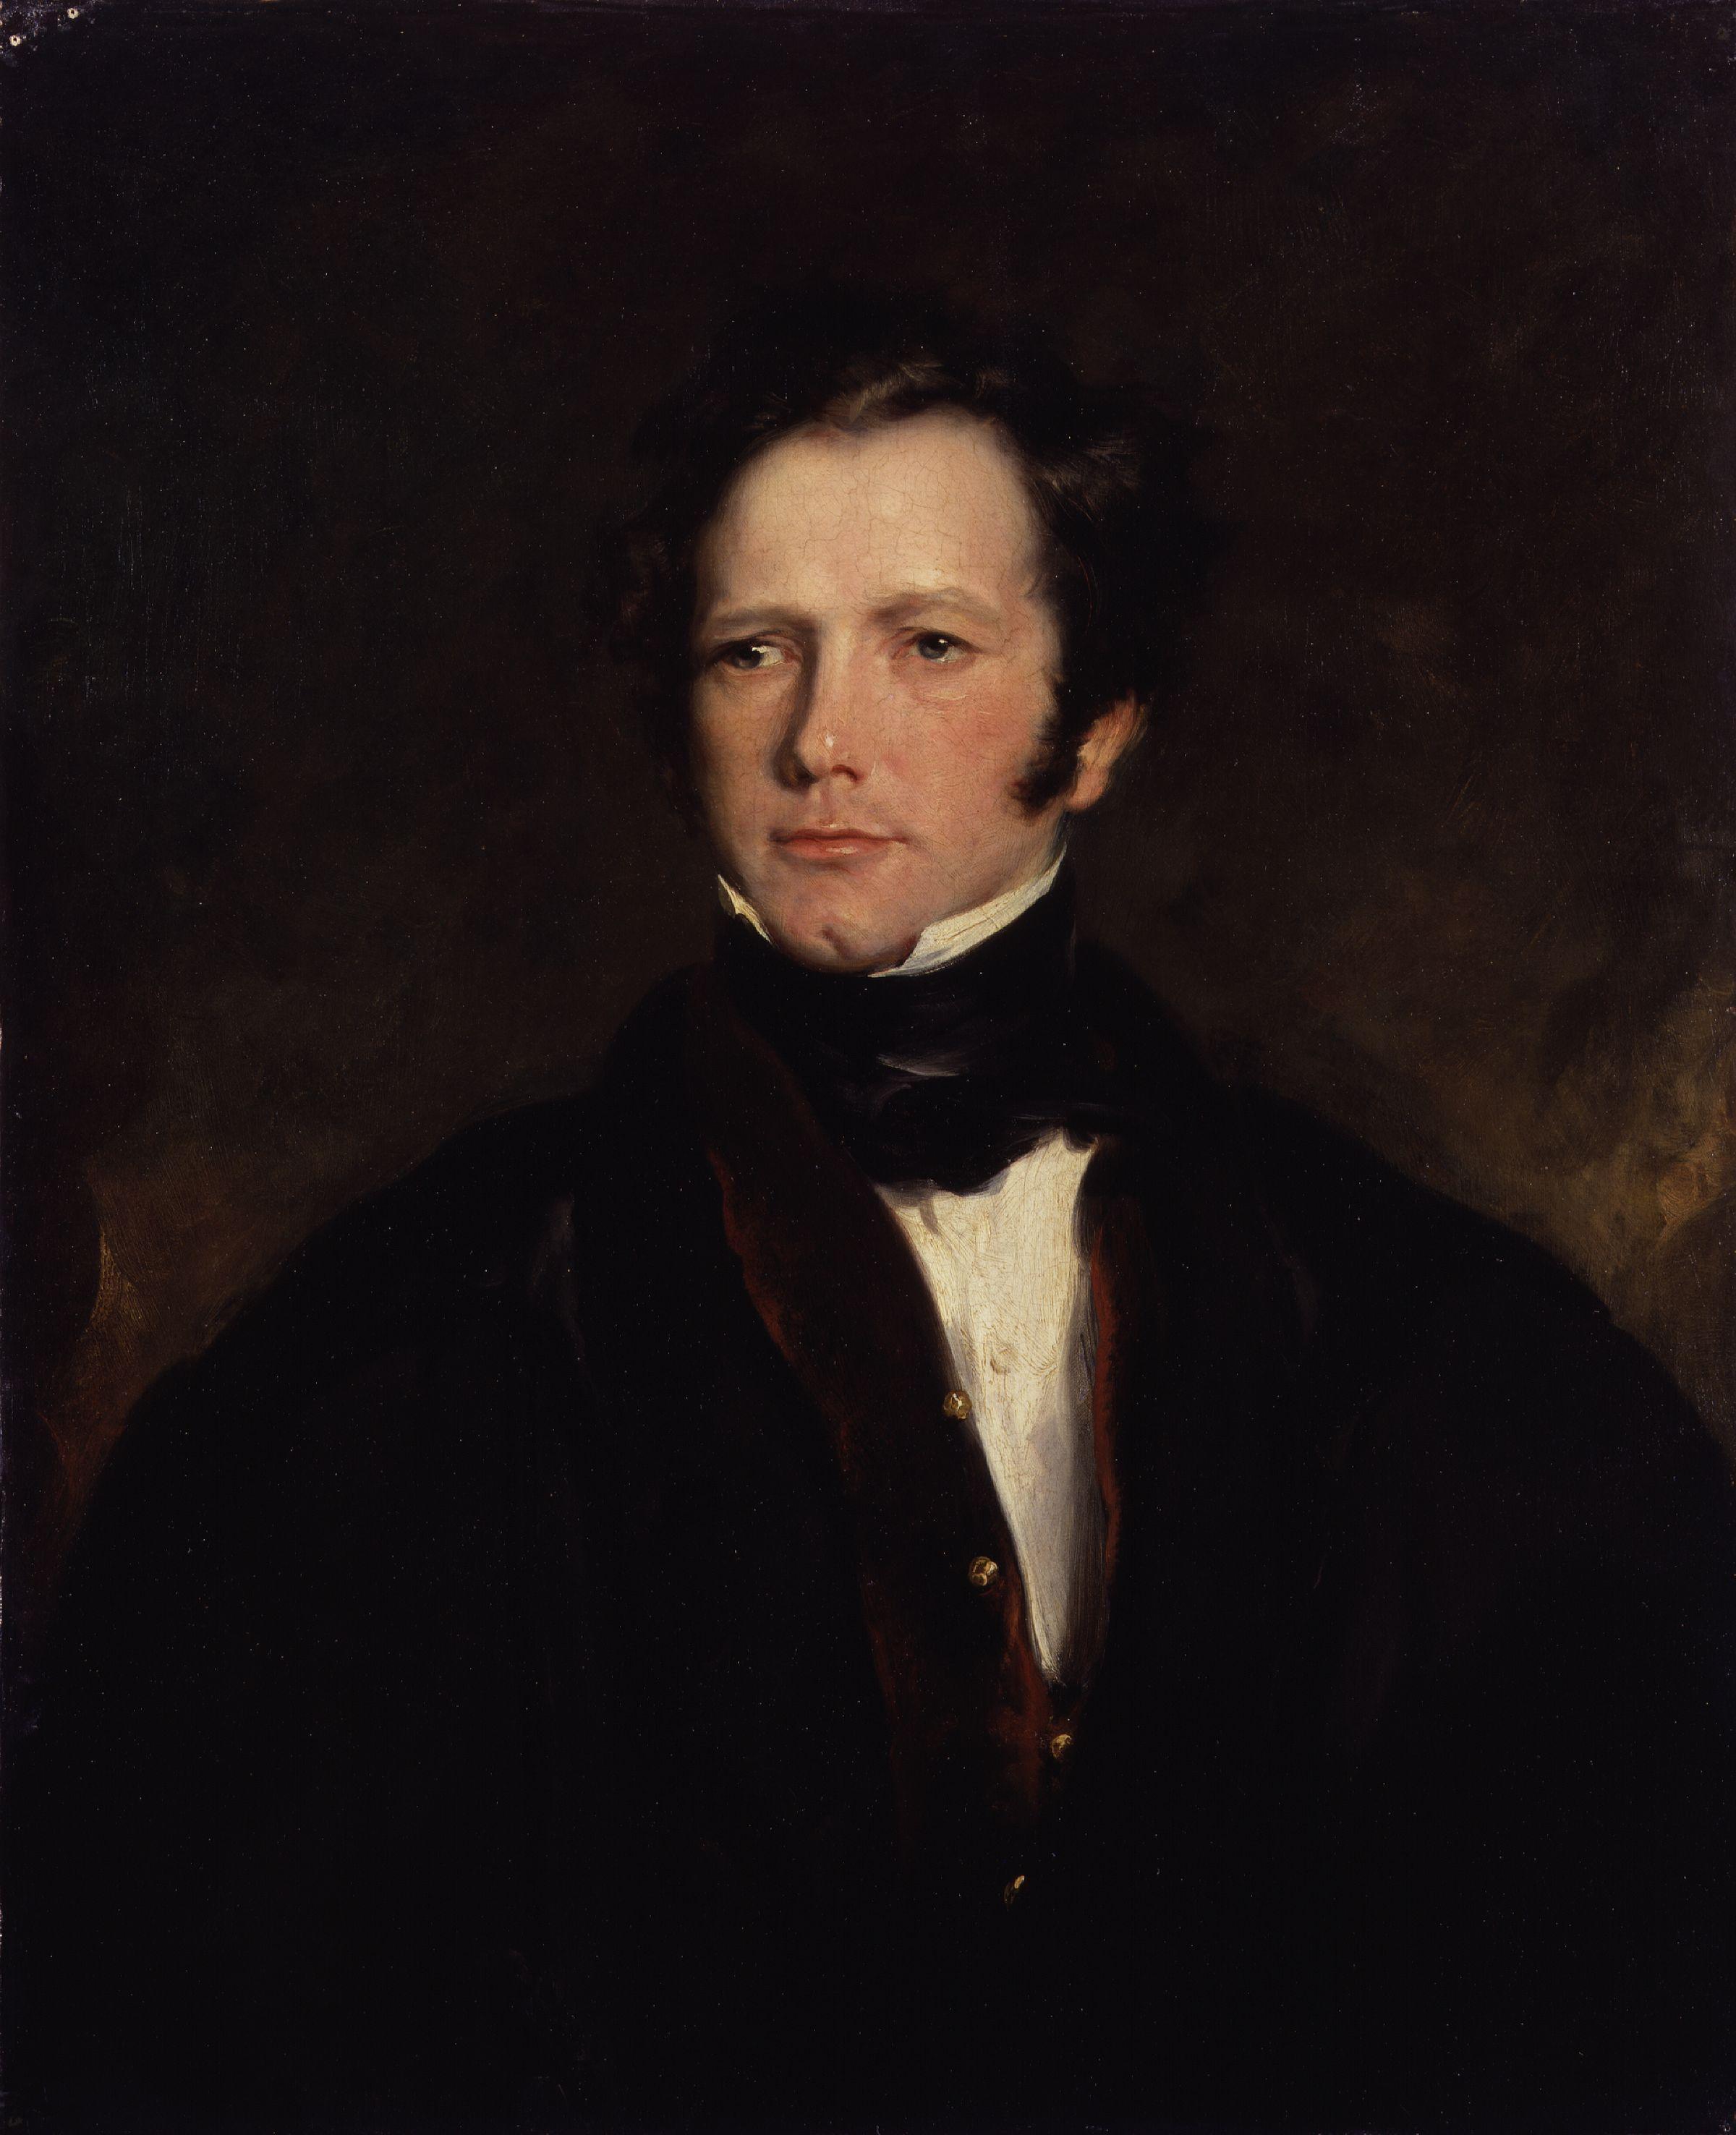 Portrait by [[John Simpson (artist)|John Simpson]], 1826